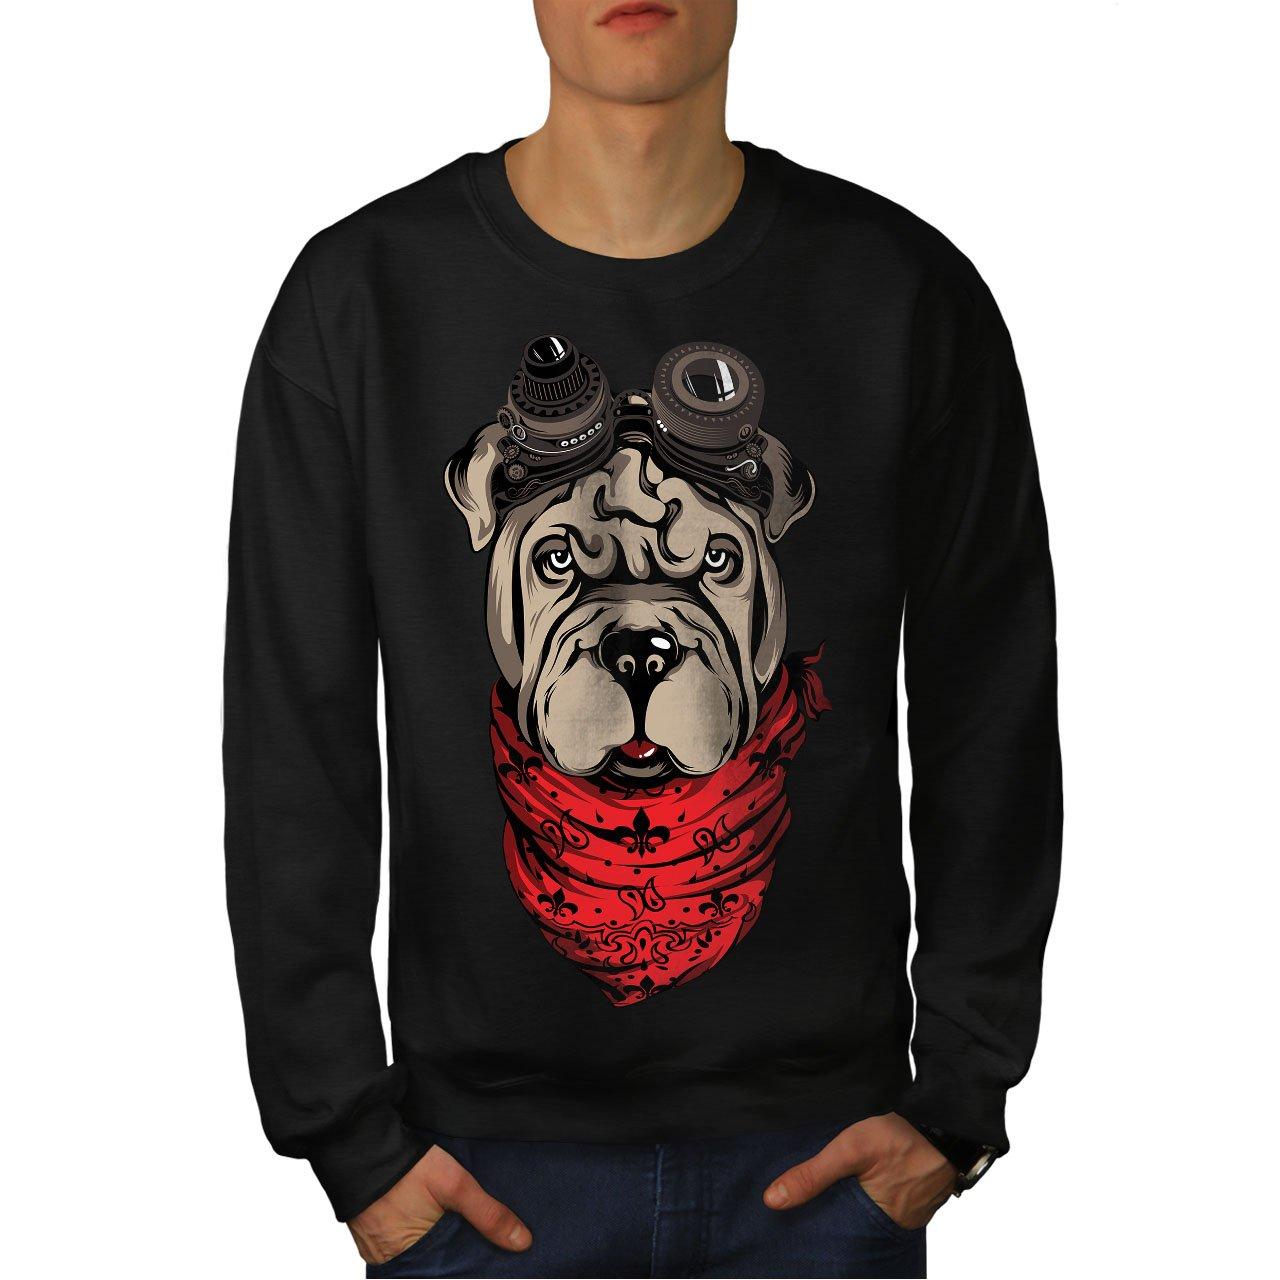 wellcoda Shar Pei Pilot Mens Sweatshirt Cute Dog Casual Jumper